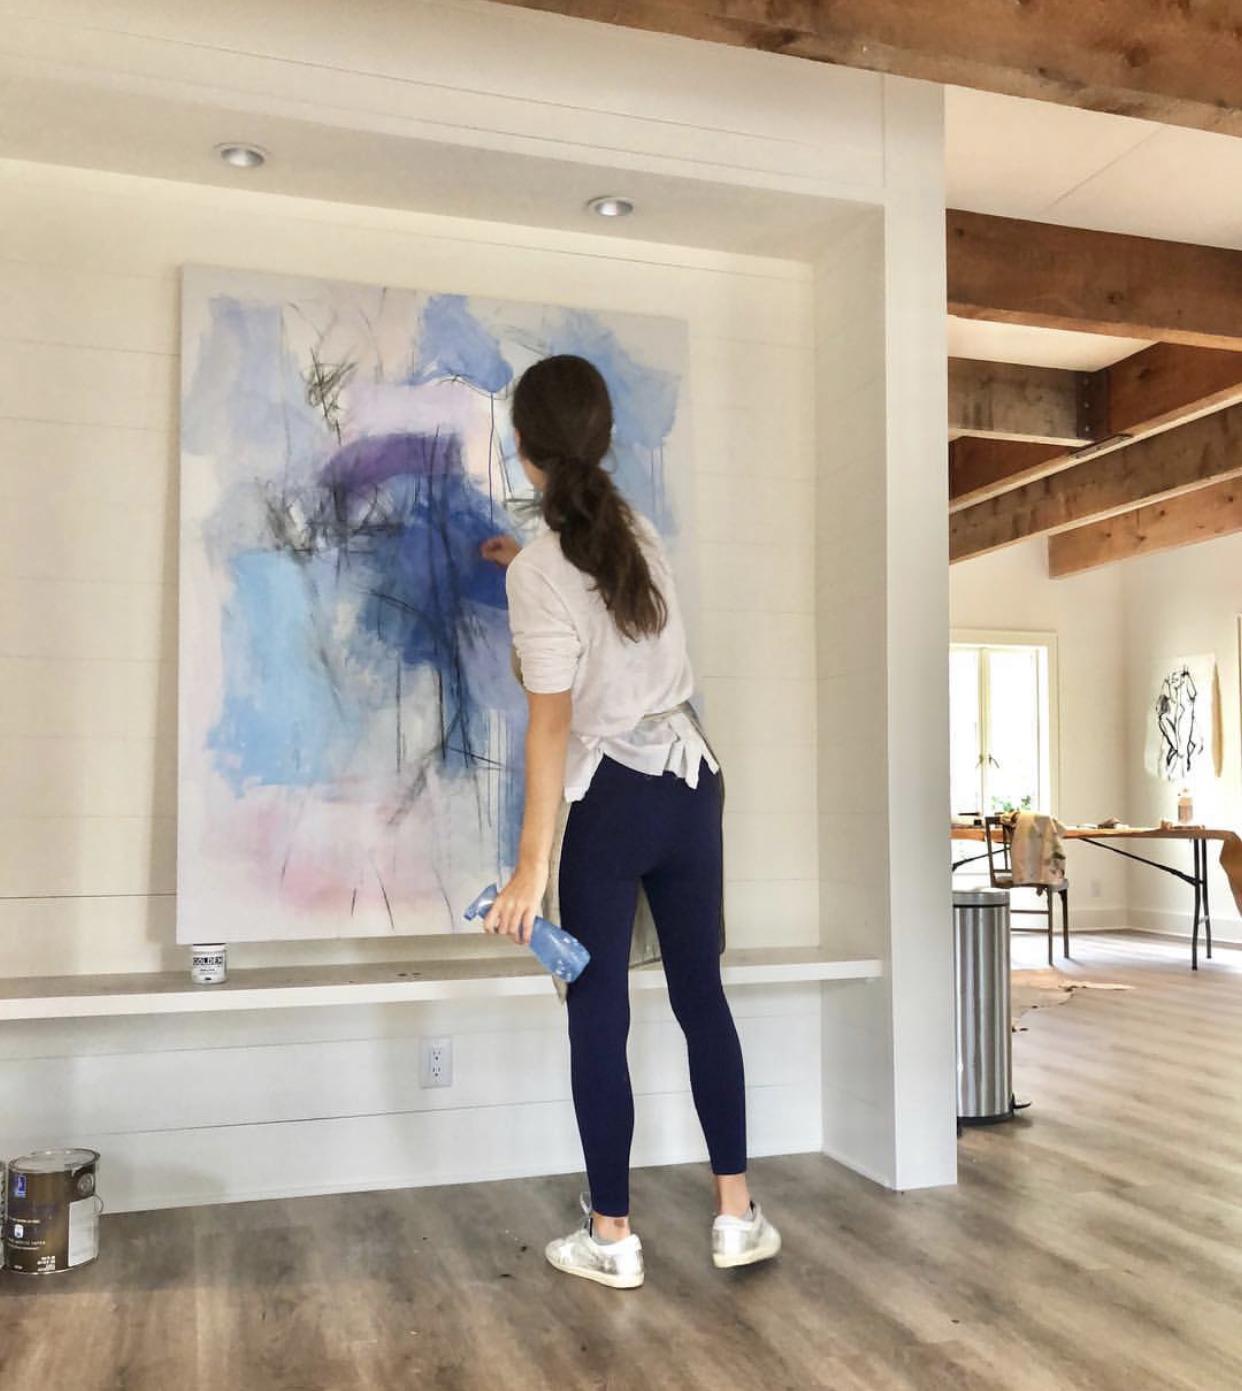 kate long stevenson in her charleston, sc studio